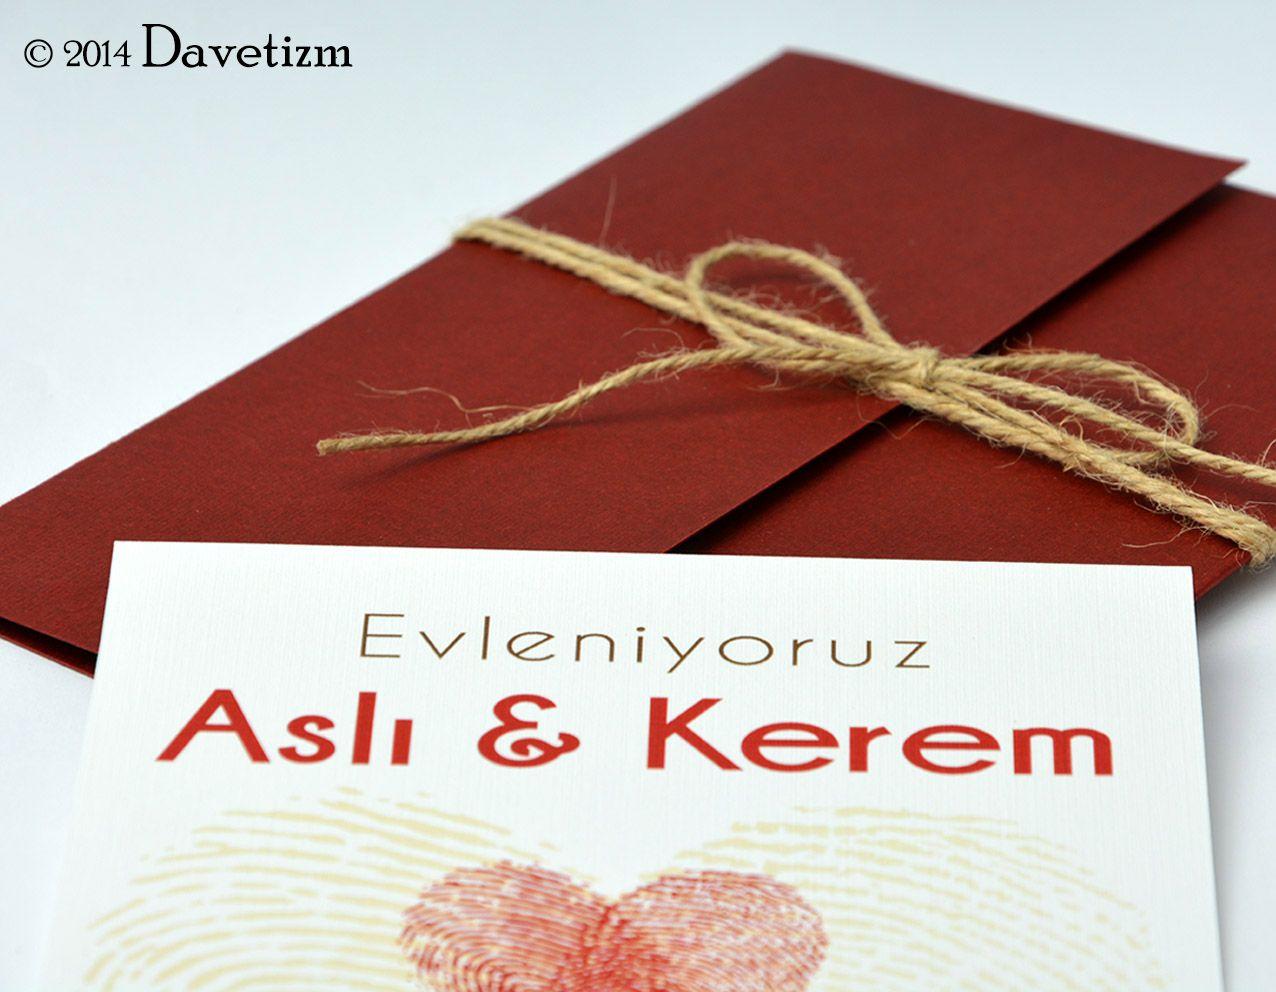 wedding invitation designs%0A Davetizm  D      n Davetiyesi  R    Romance  Davetiye  Tasar  m  Wedding   Invitation